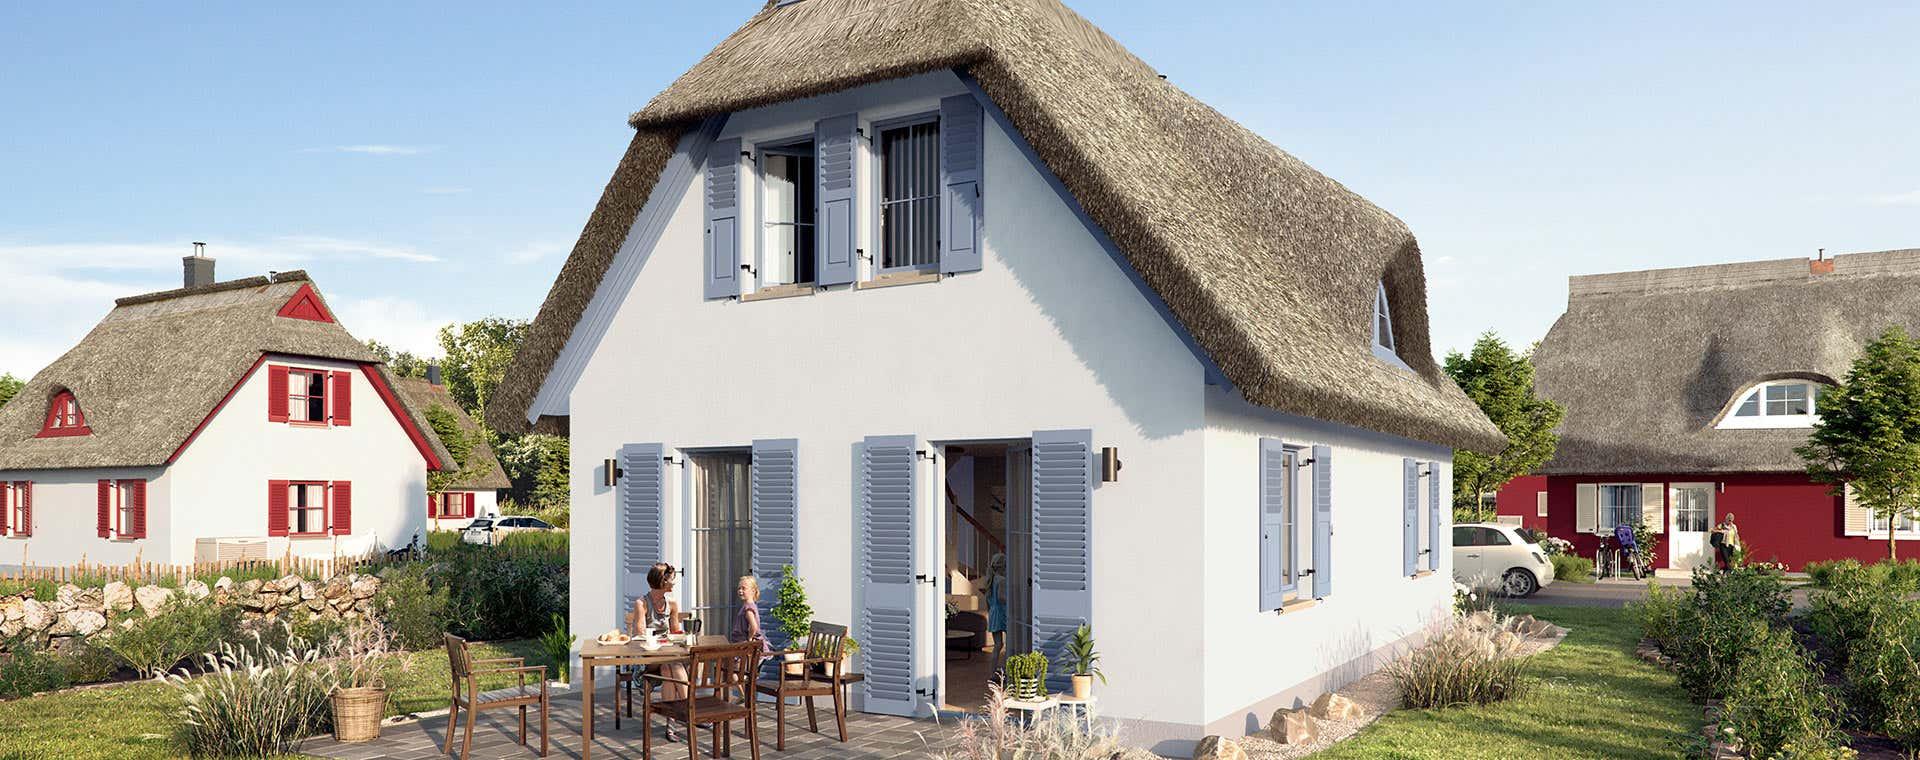 Berühmt Reetdachhaus kaufen an der Ostee - Bonava FB55